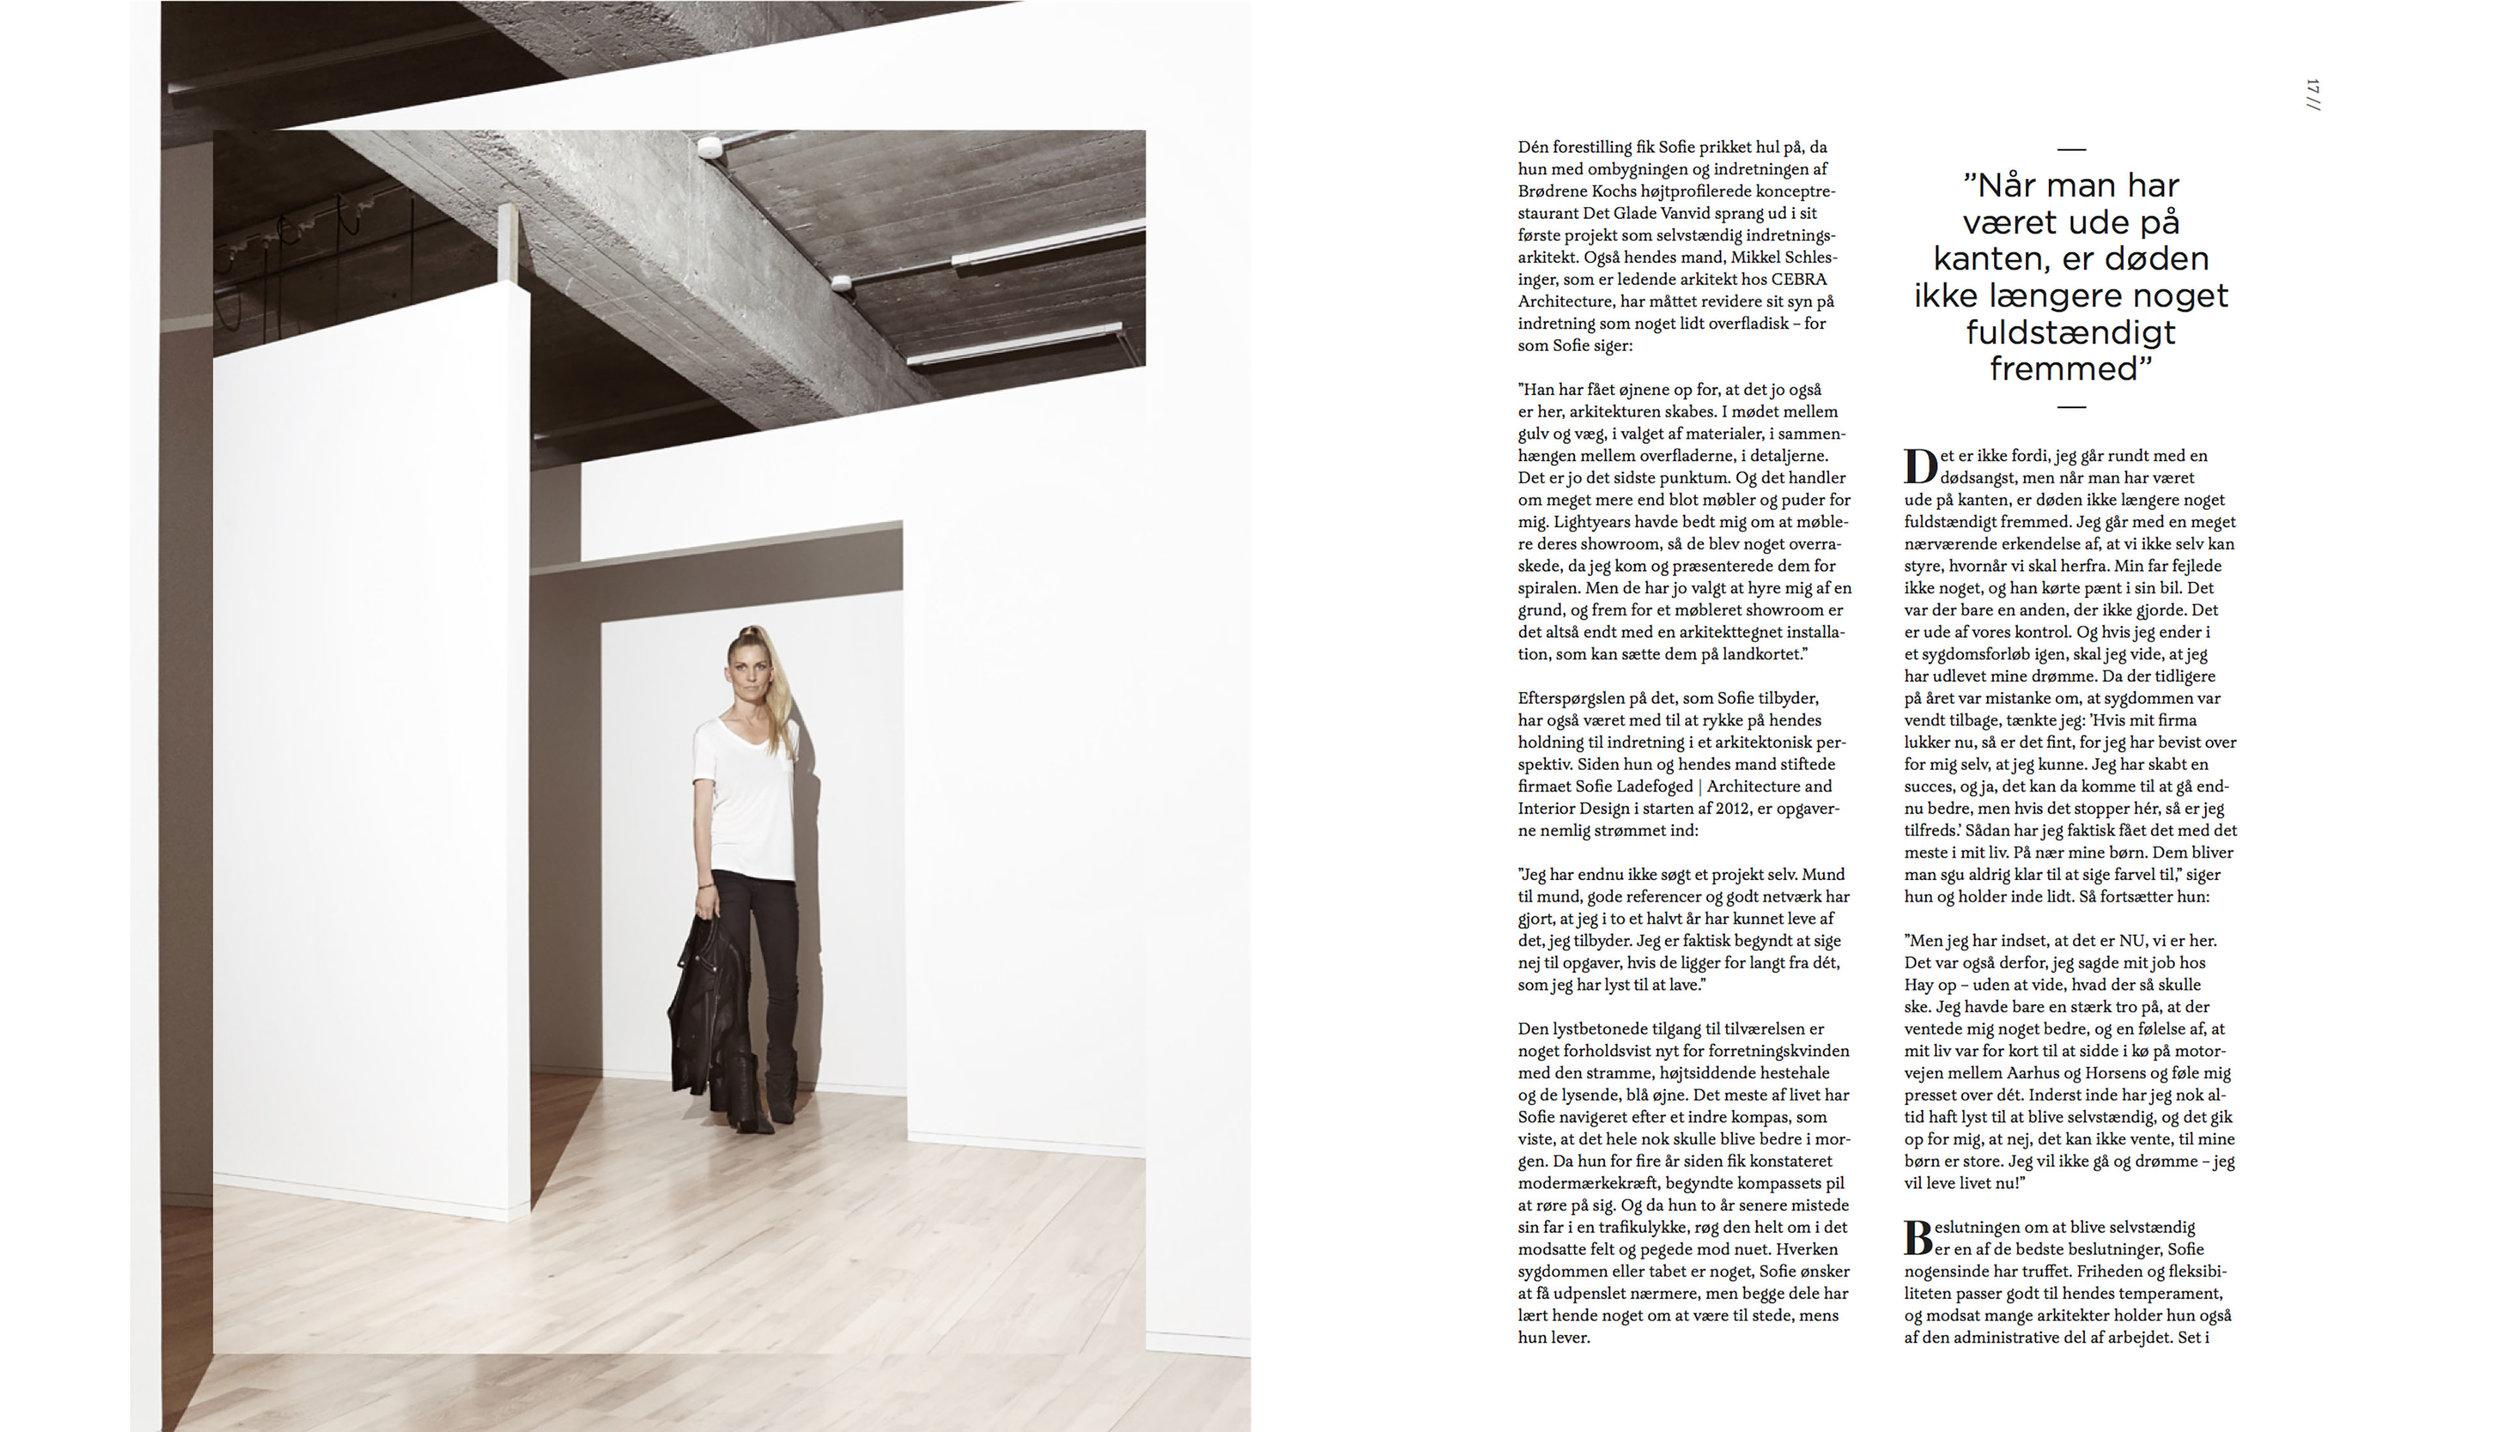 sofie-ladefoged-press-note-magazine-2014-page-03.jpg